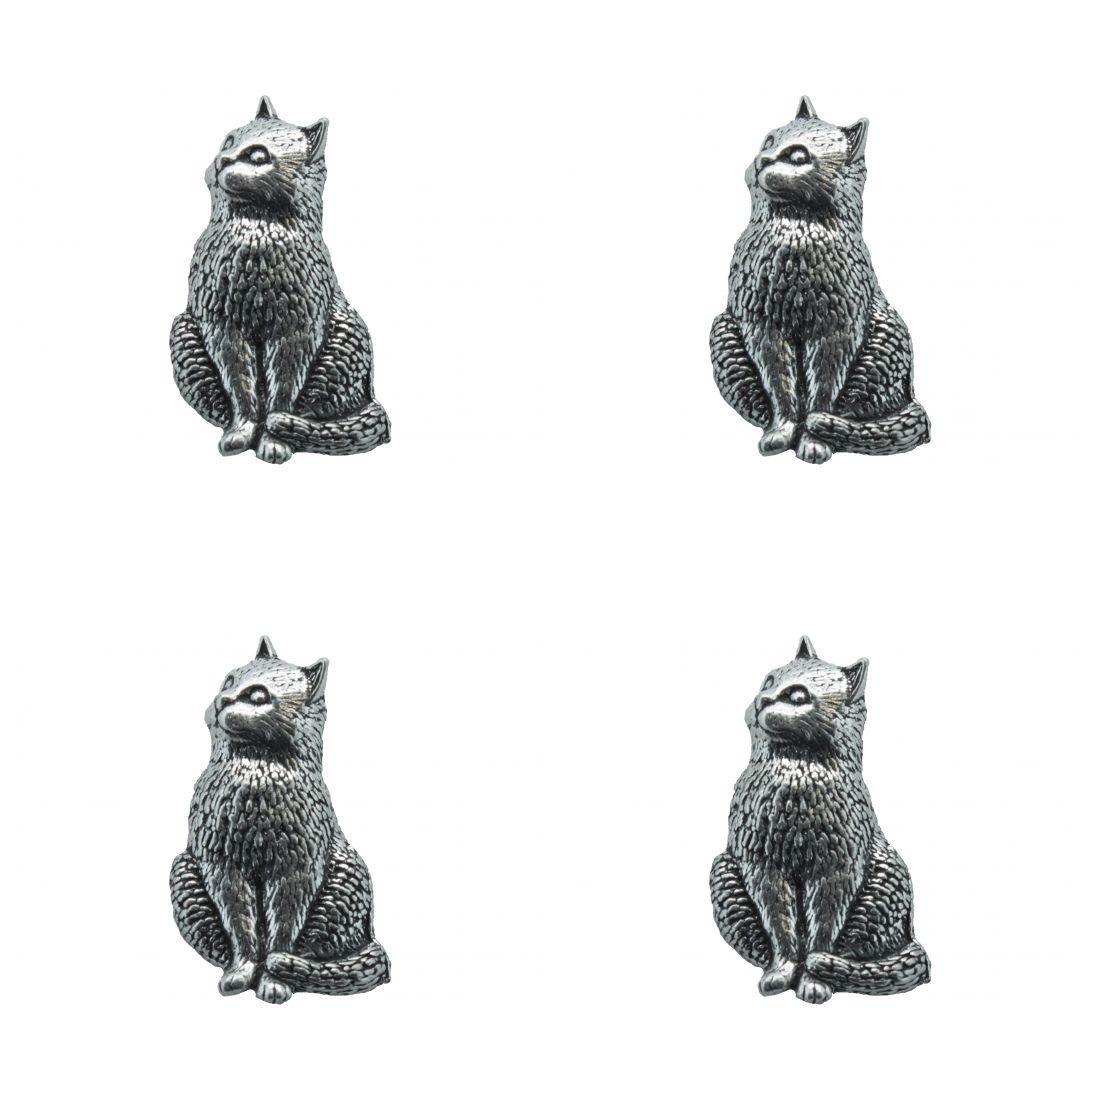 4x Pin Anstecker Badge Katze sitzend, 1,9x3,3cm